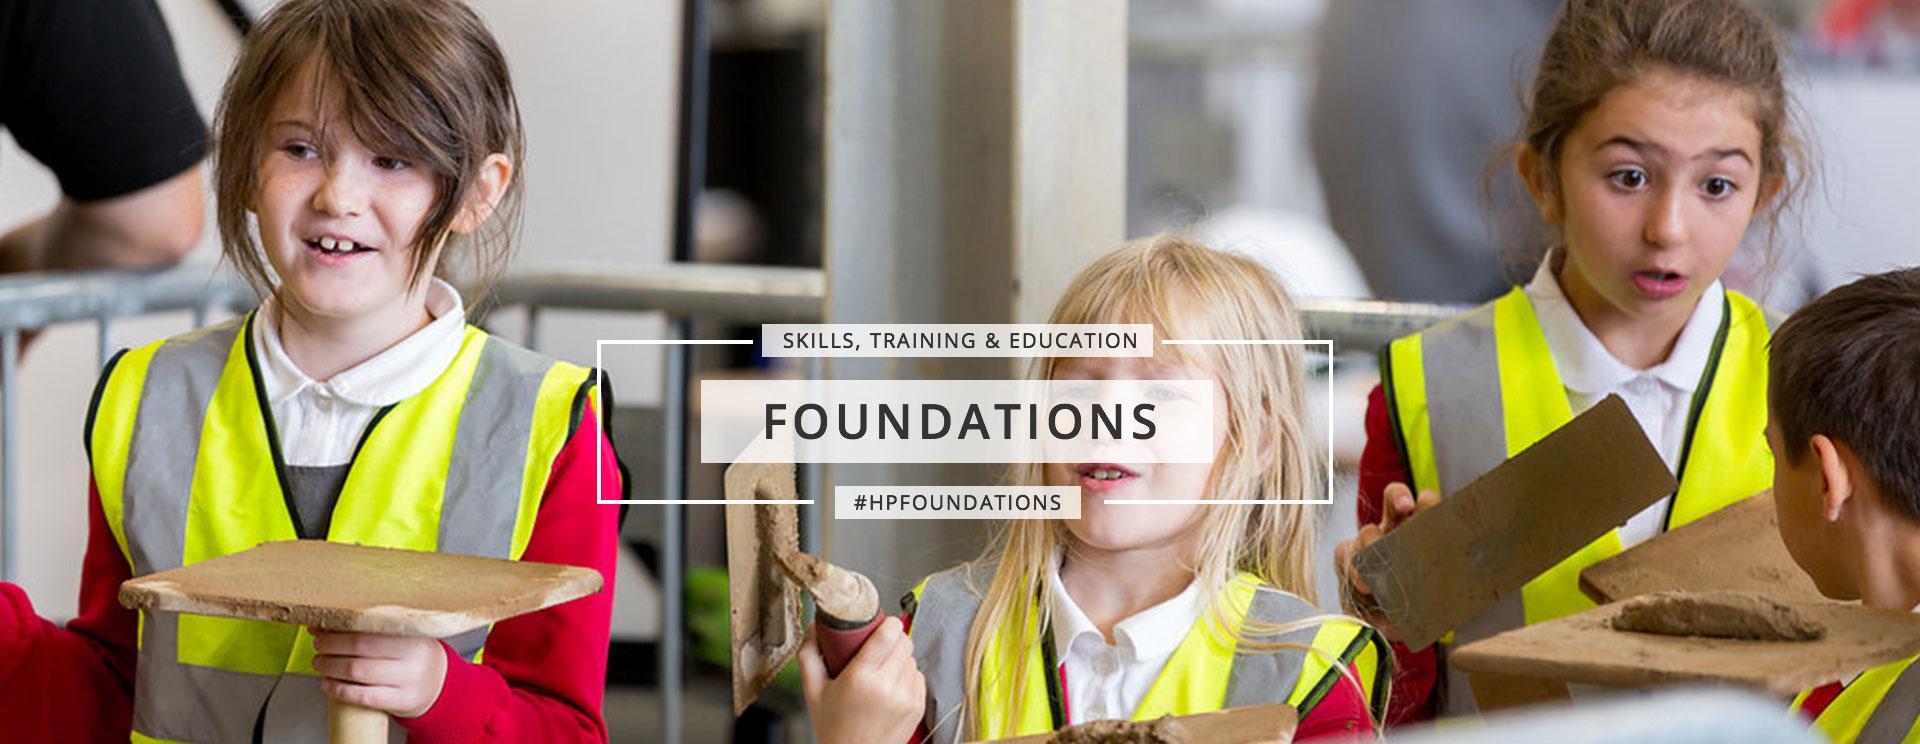 foundations-slide